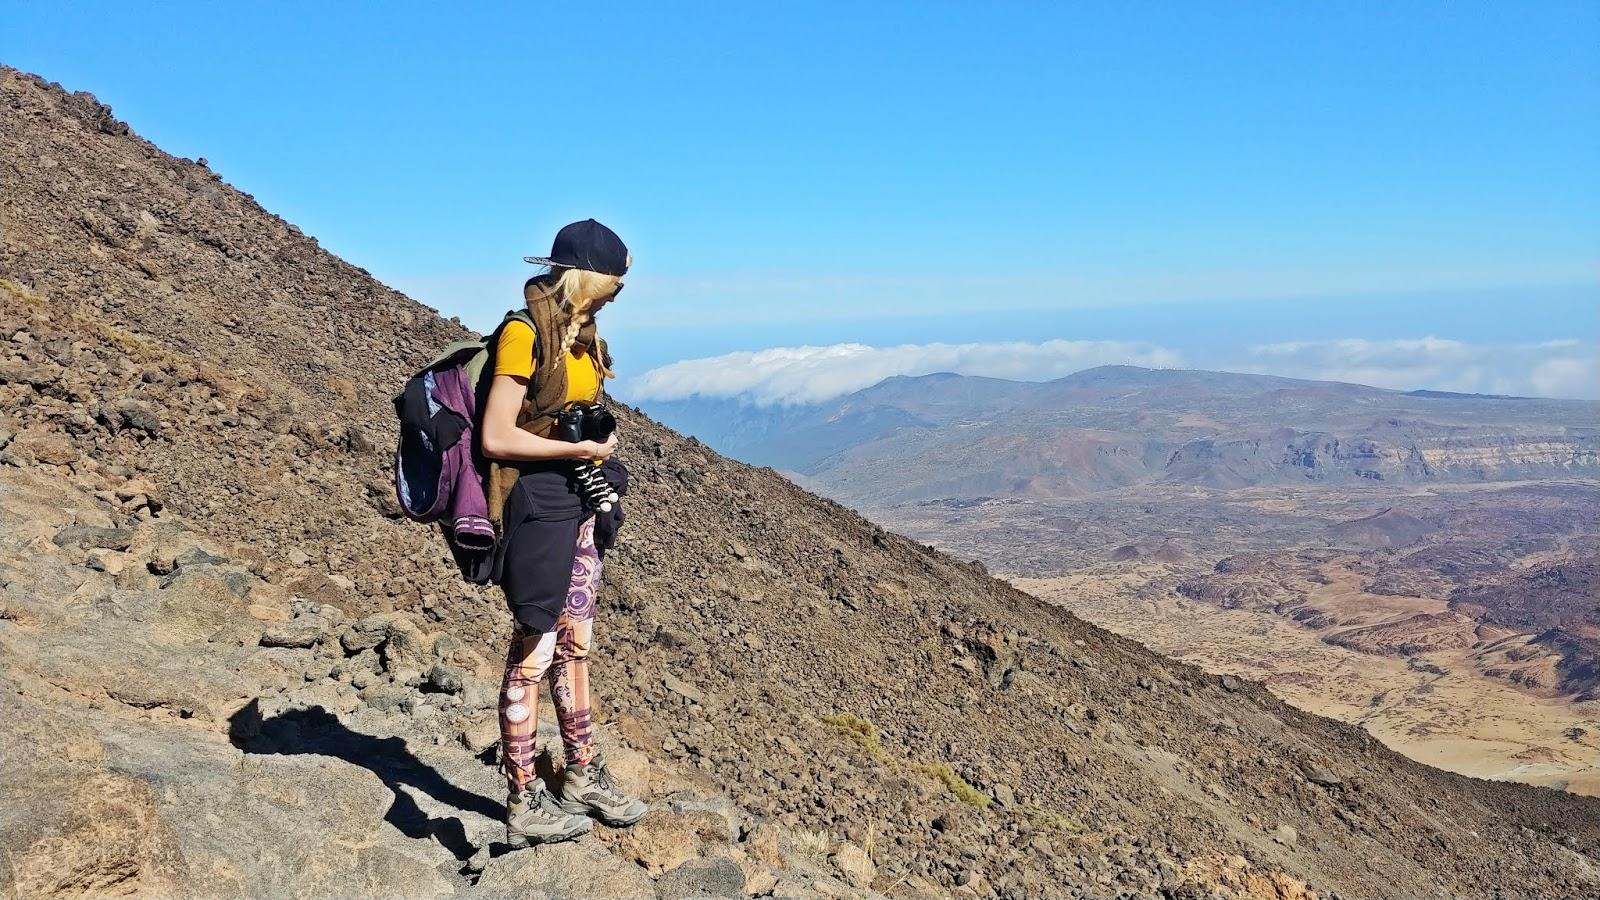 Wulkan Teide Wejscie Zima I Latem Wild Heart Tour